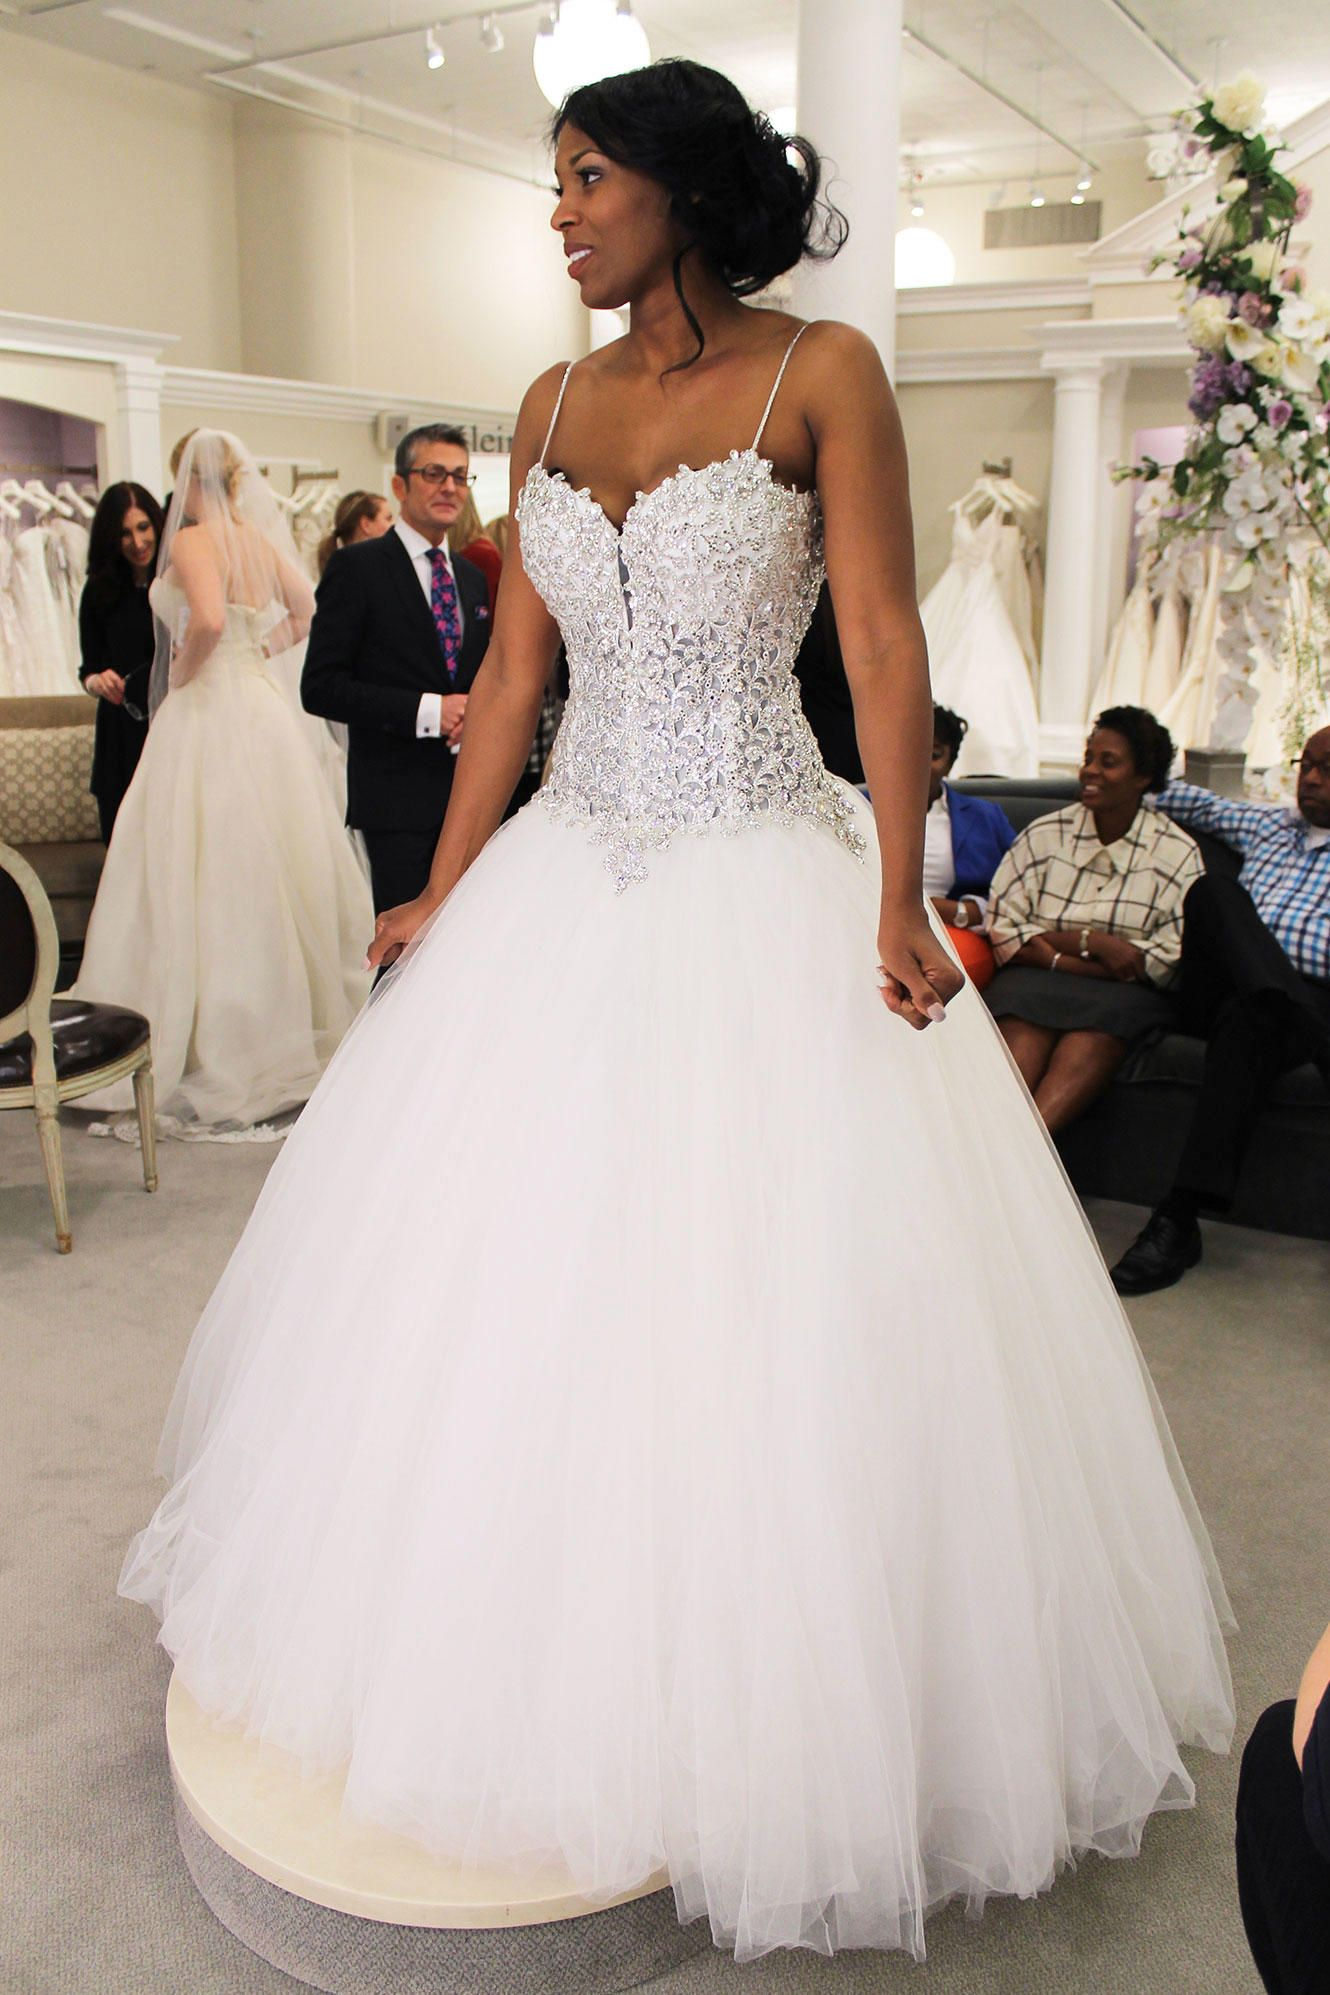 Season 14 Featured Dress Pnina Tornai All bling top